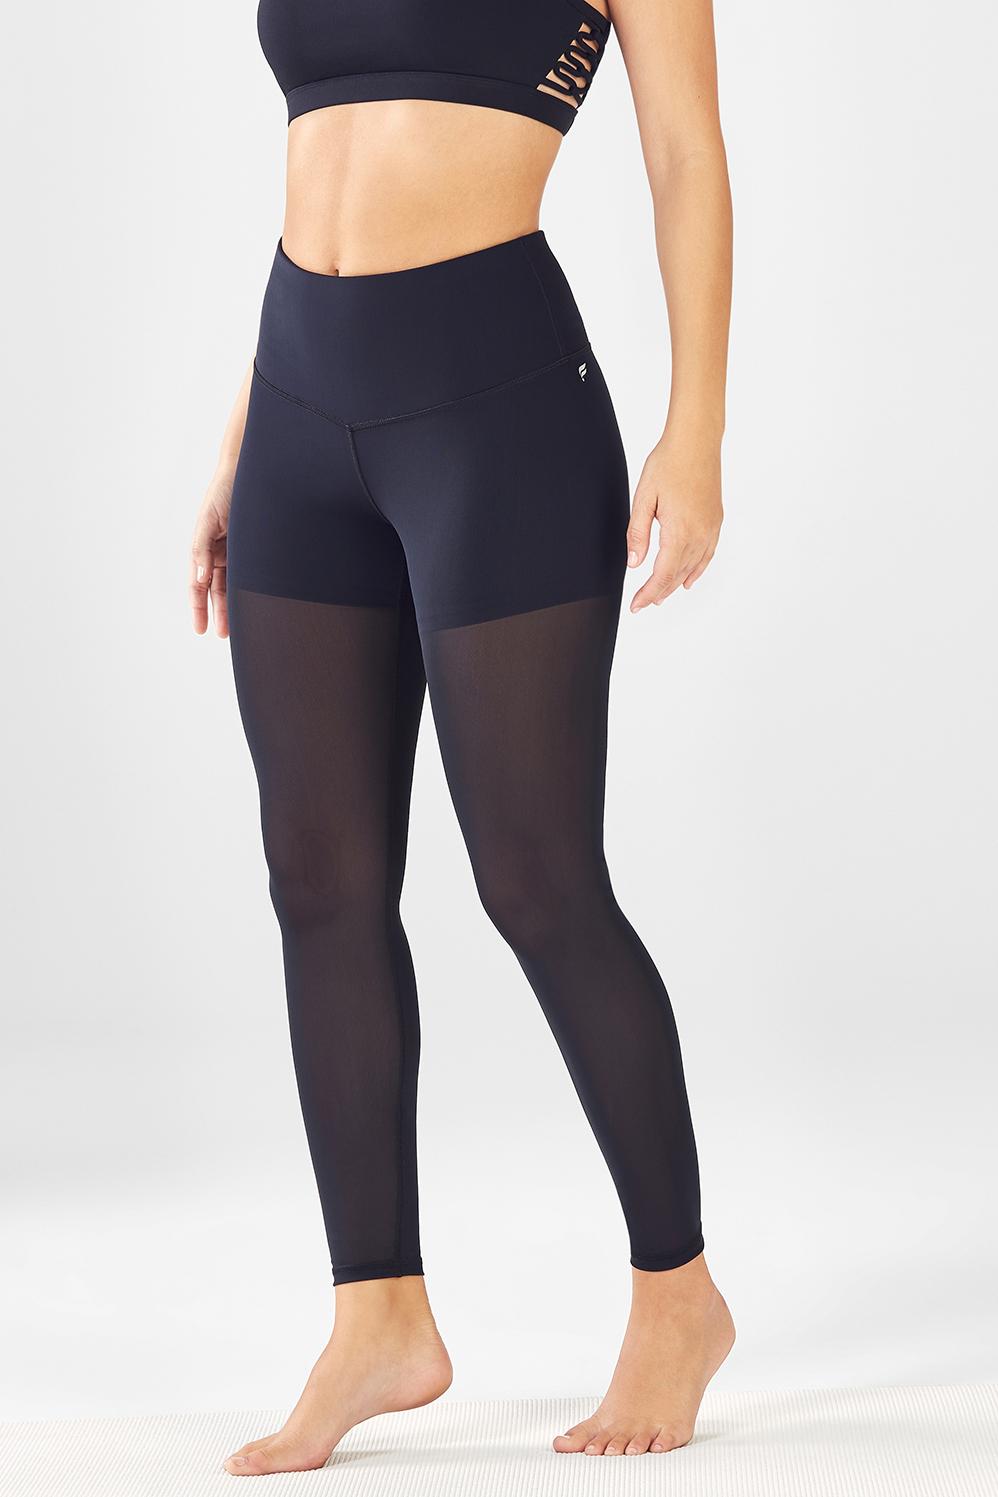 c74283f8e1b High-Waisted Mesh PureLuxe Legging - Fabletics